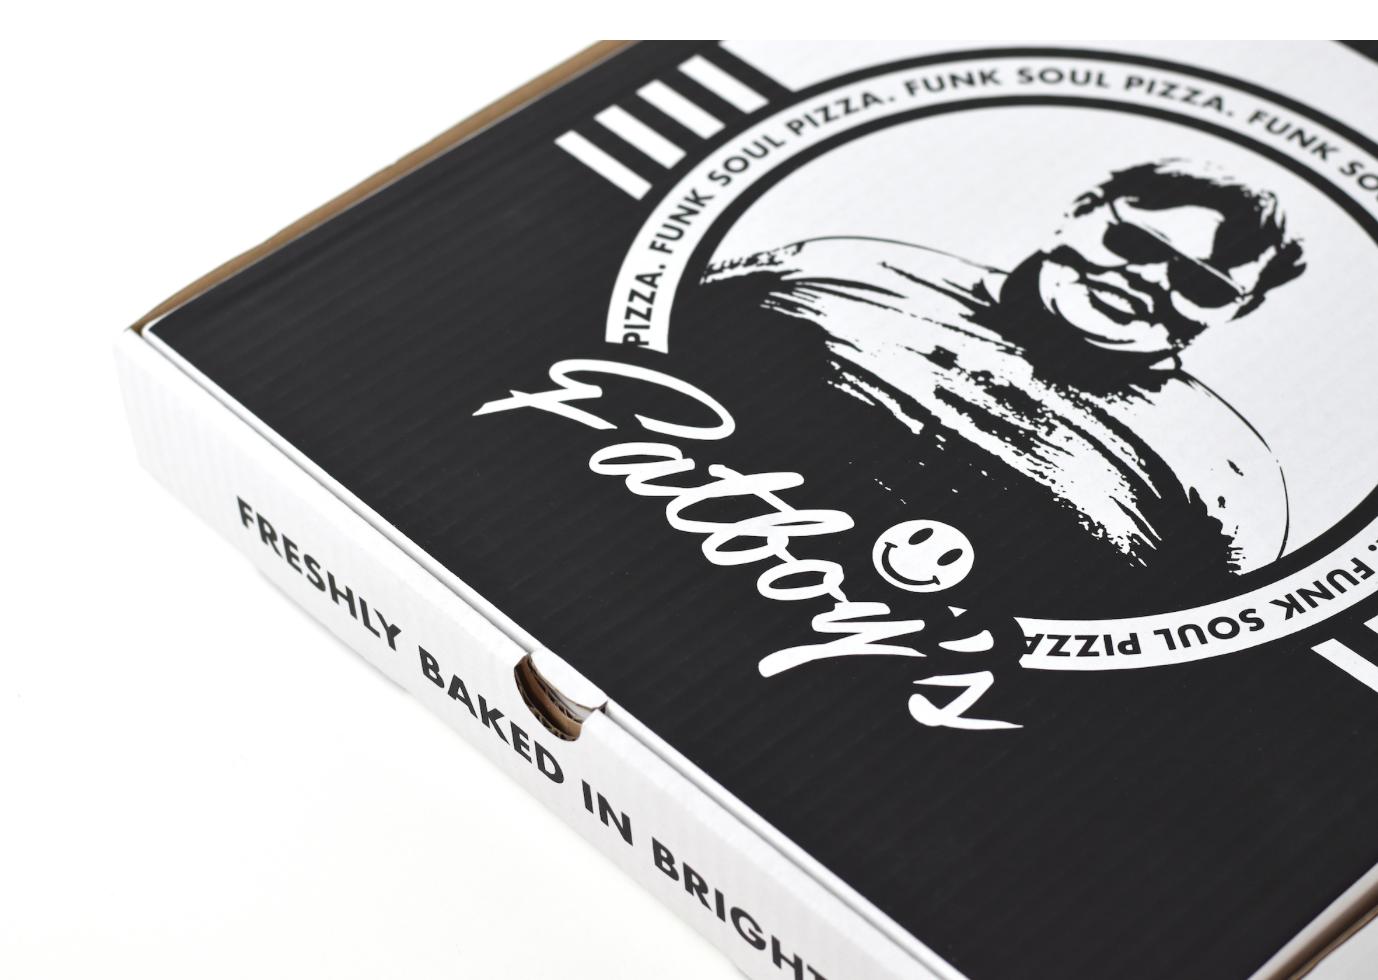 Fatboy Slim special edition branding